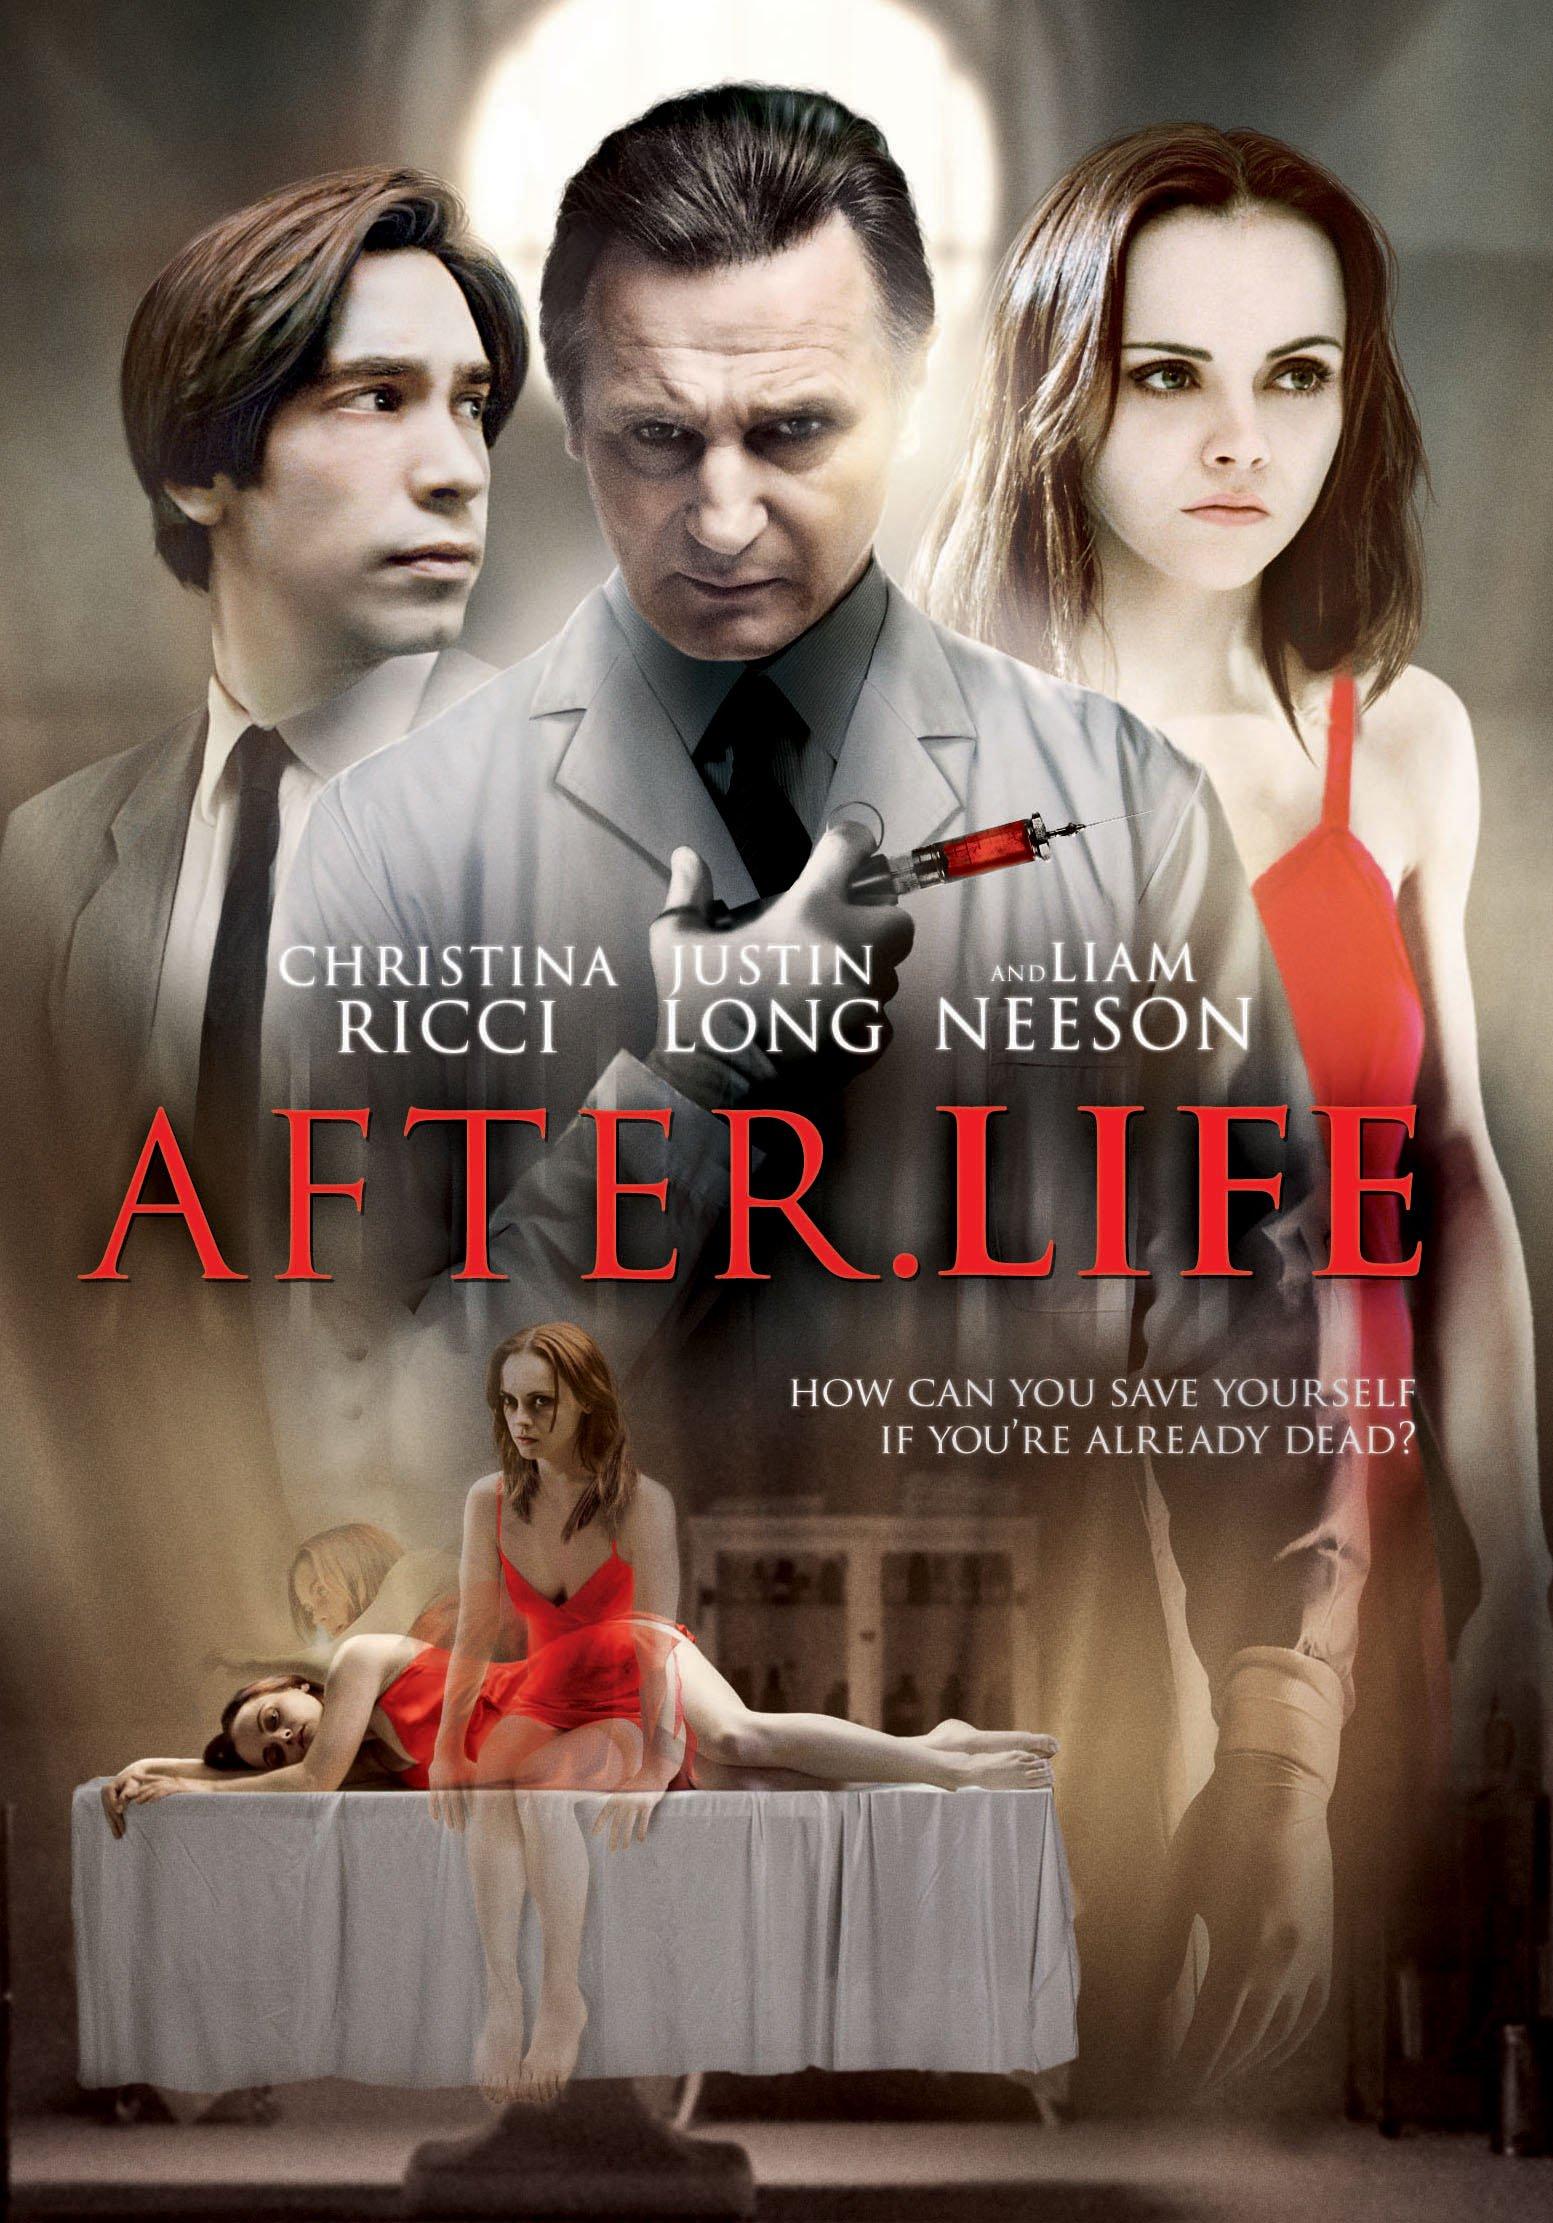 DVD : After.Life (DVD)